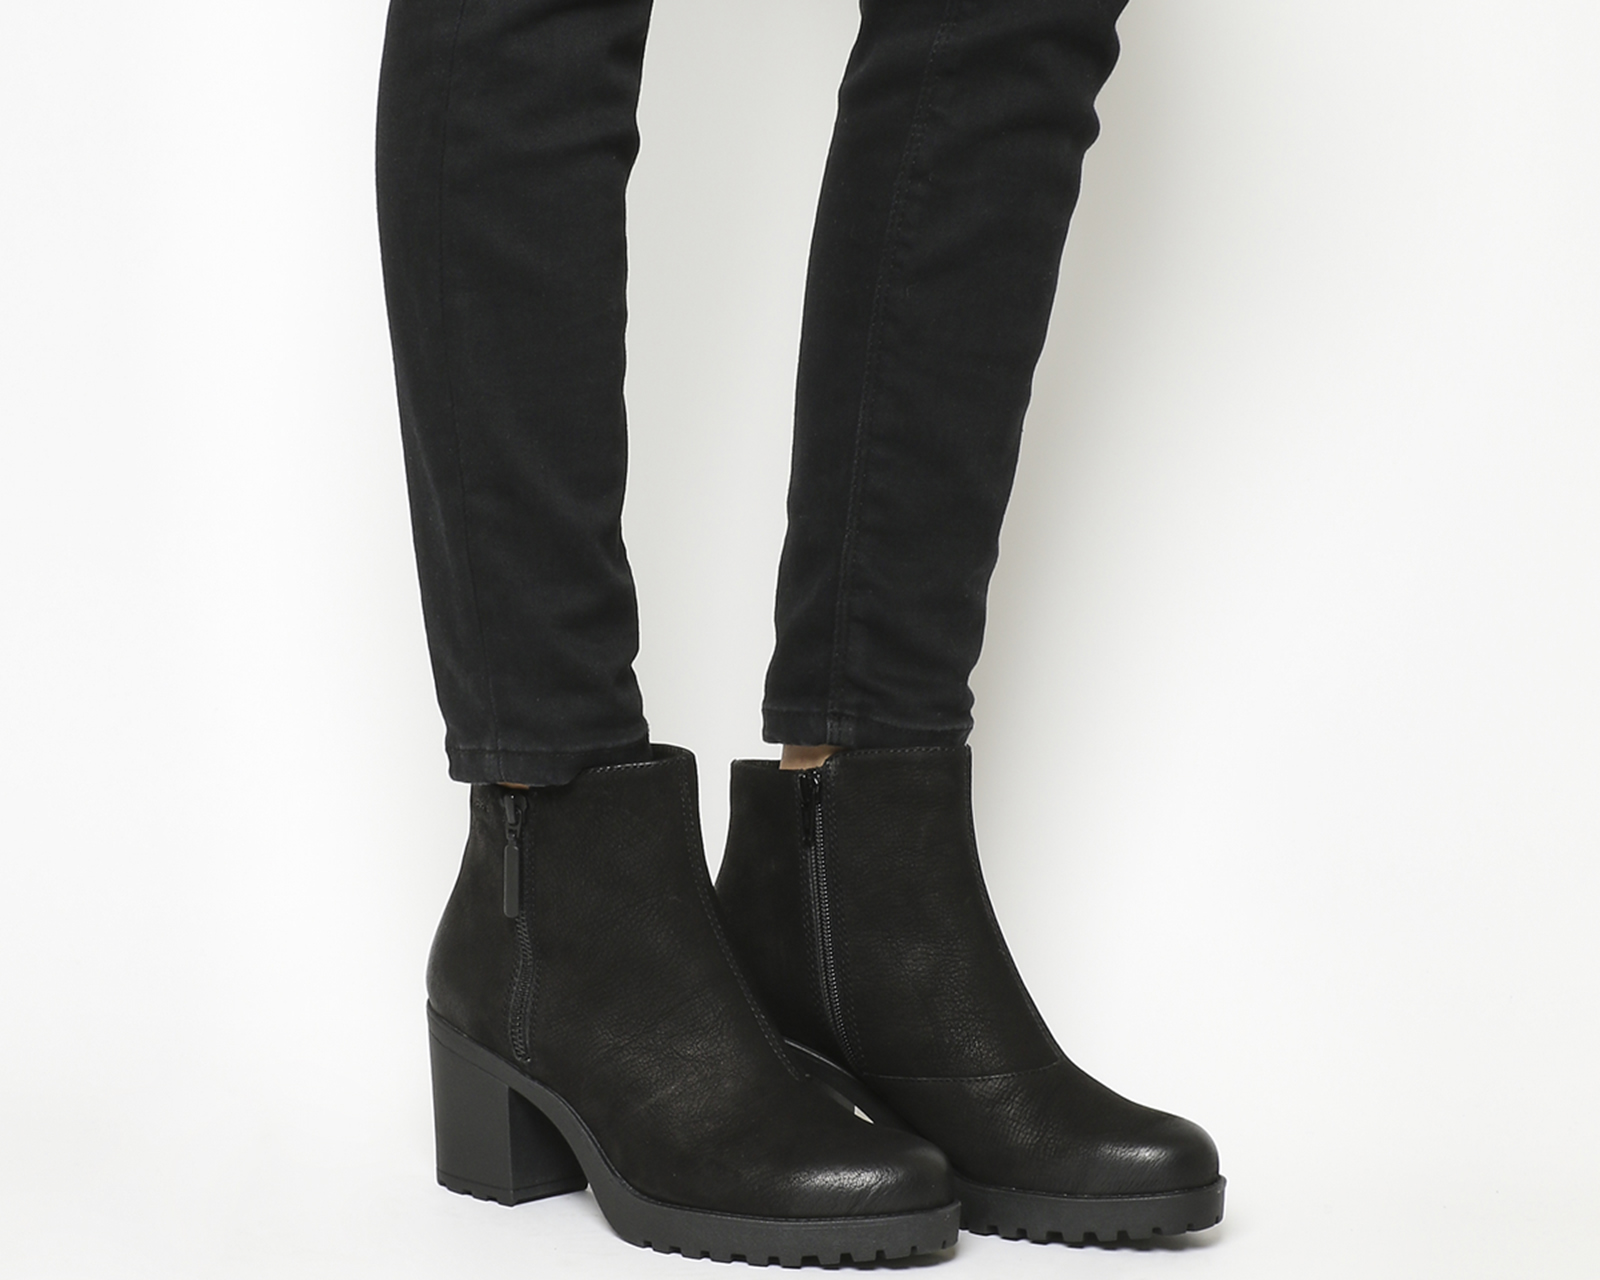 d9107c84192a Sentinel Thumbnail 1. Sentinel Womens Vagabond Grace Zip Boots Black ...